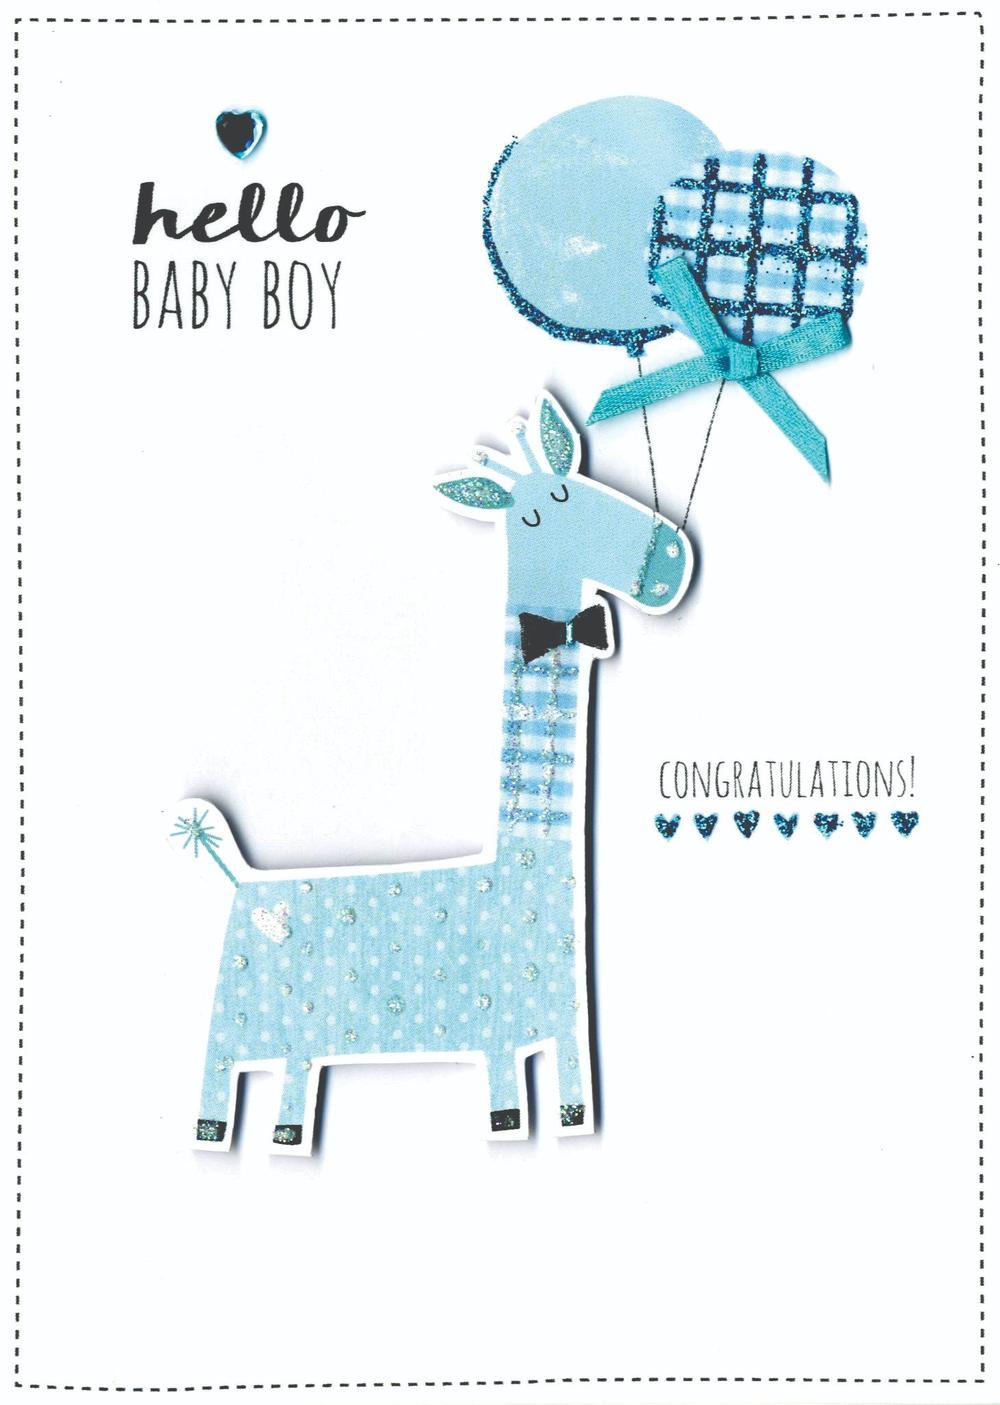 Baby Boy Congratulations New Baby Greeting Card